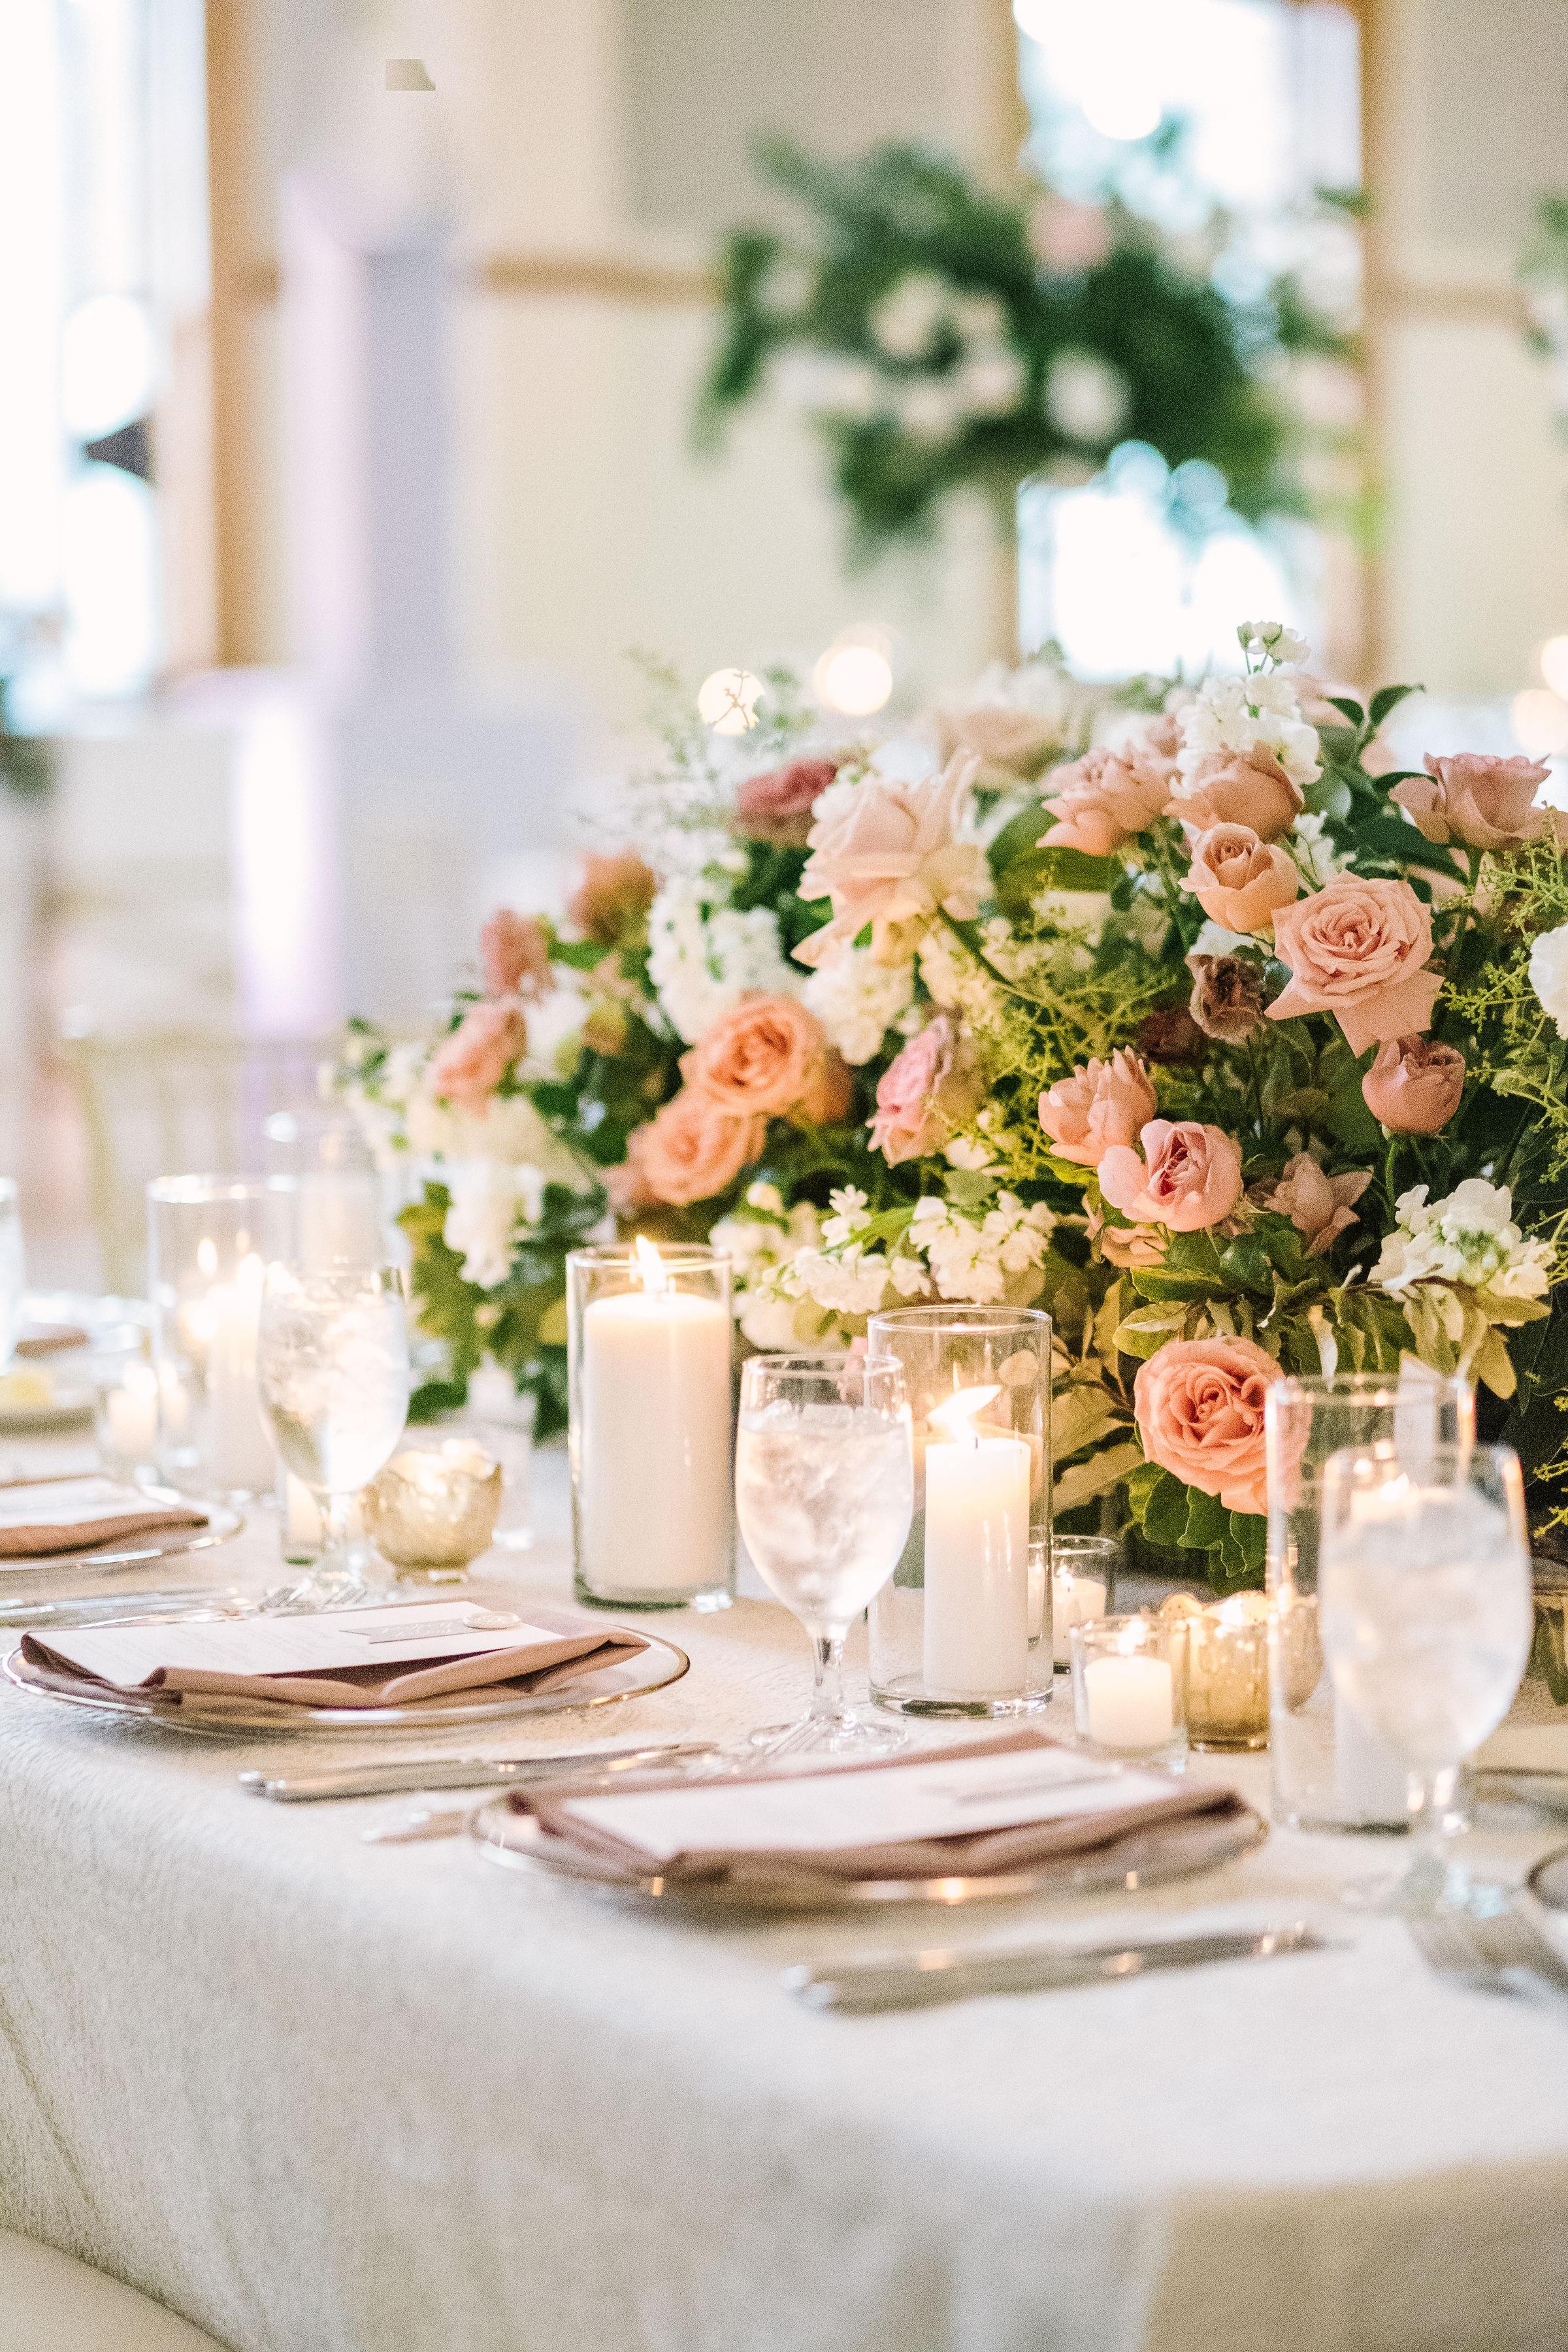 Ellen-Ashton-Photography-Girt-and-gold-events-weddings-Ashton-Depot-Weddings713.jpg